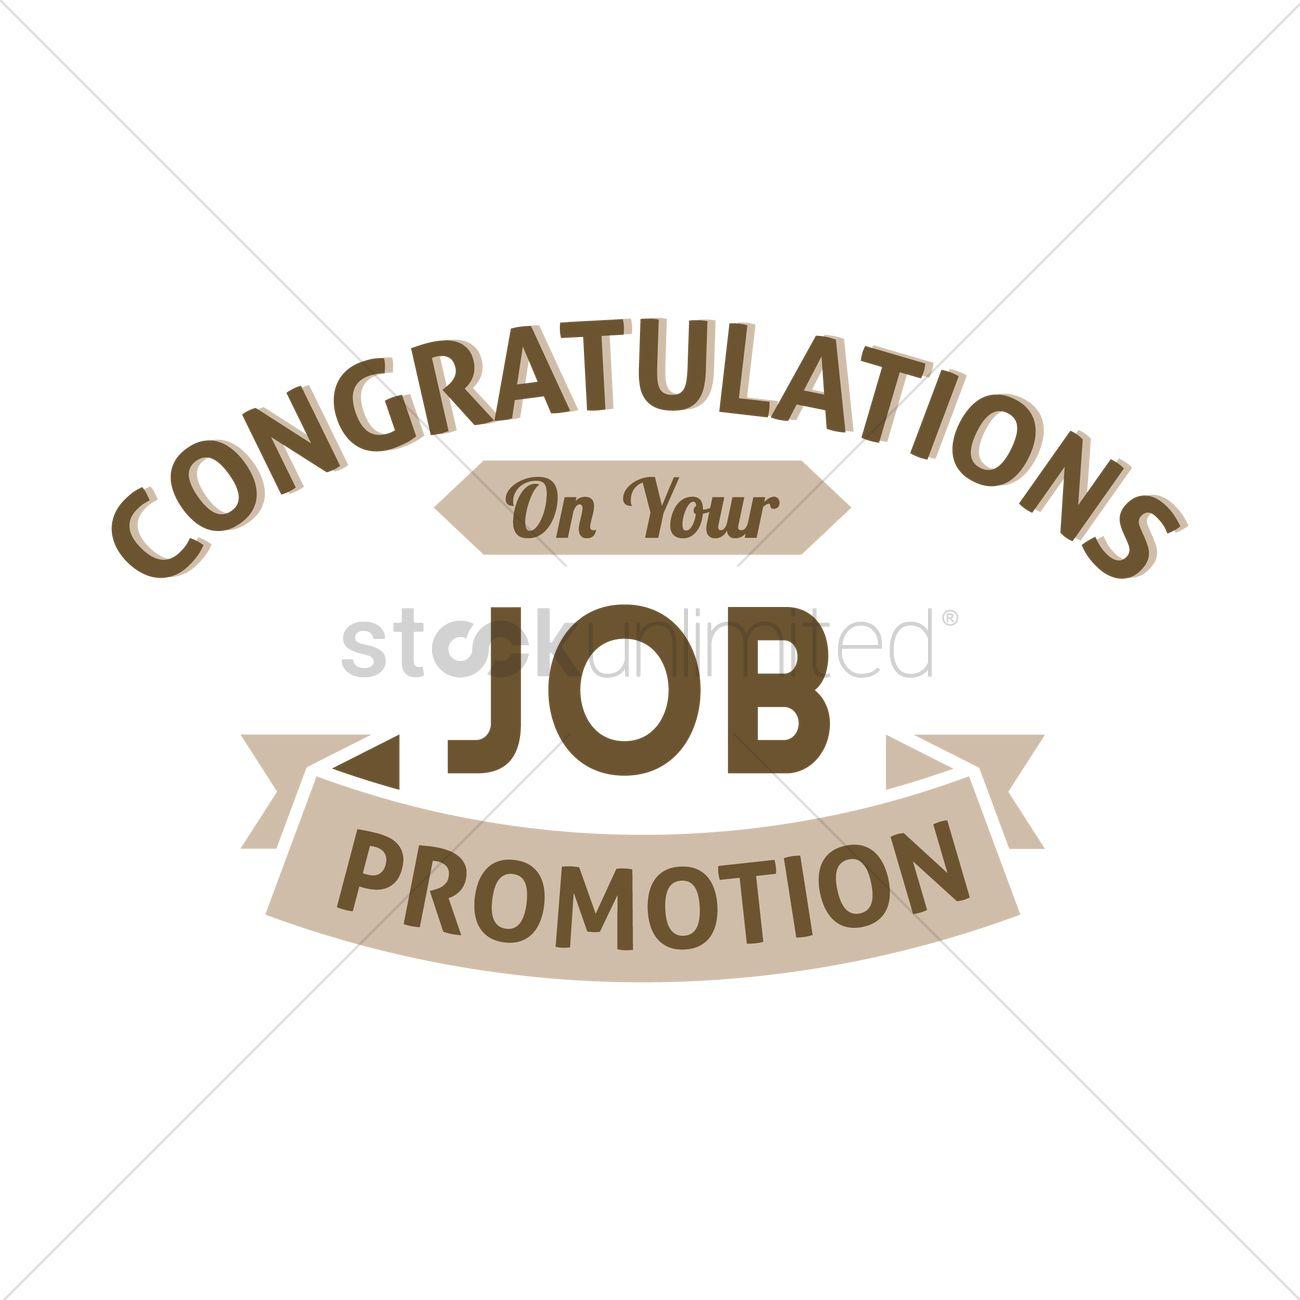 congrats congratulation congratulations congratulate congratulation job promotion wish